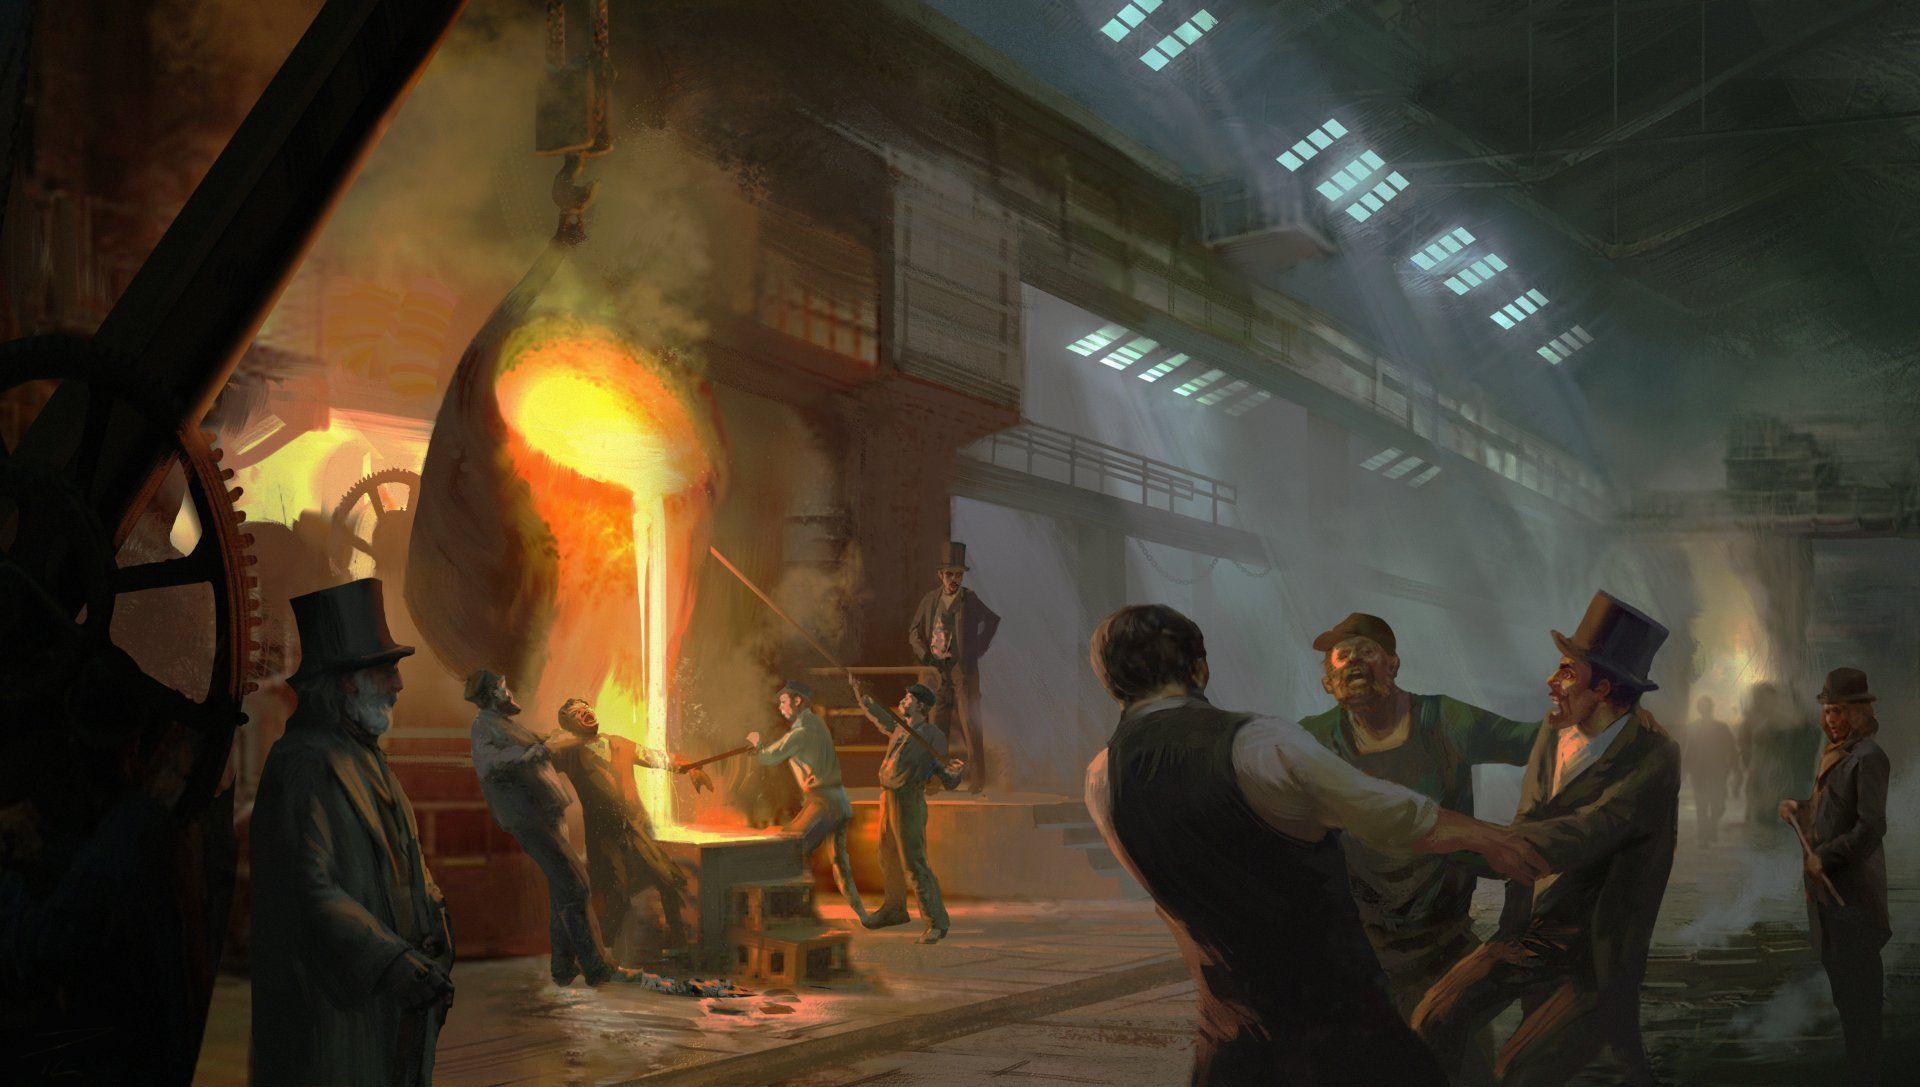 Assassin's Creed Syndicate #AssassinsCreedSyndicate #PC #PlayStation4 #XboxOne #AssassinsCreed #JacobFyre